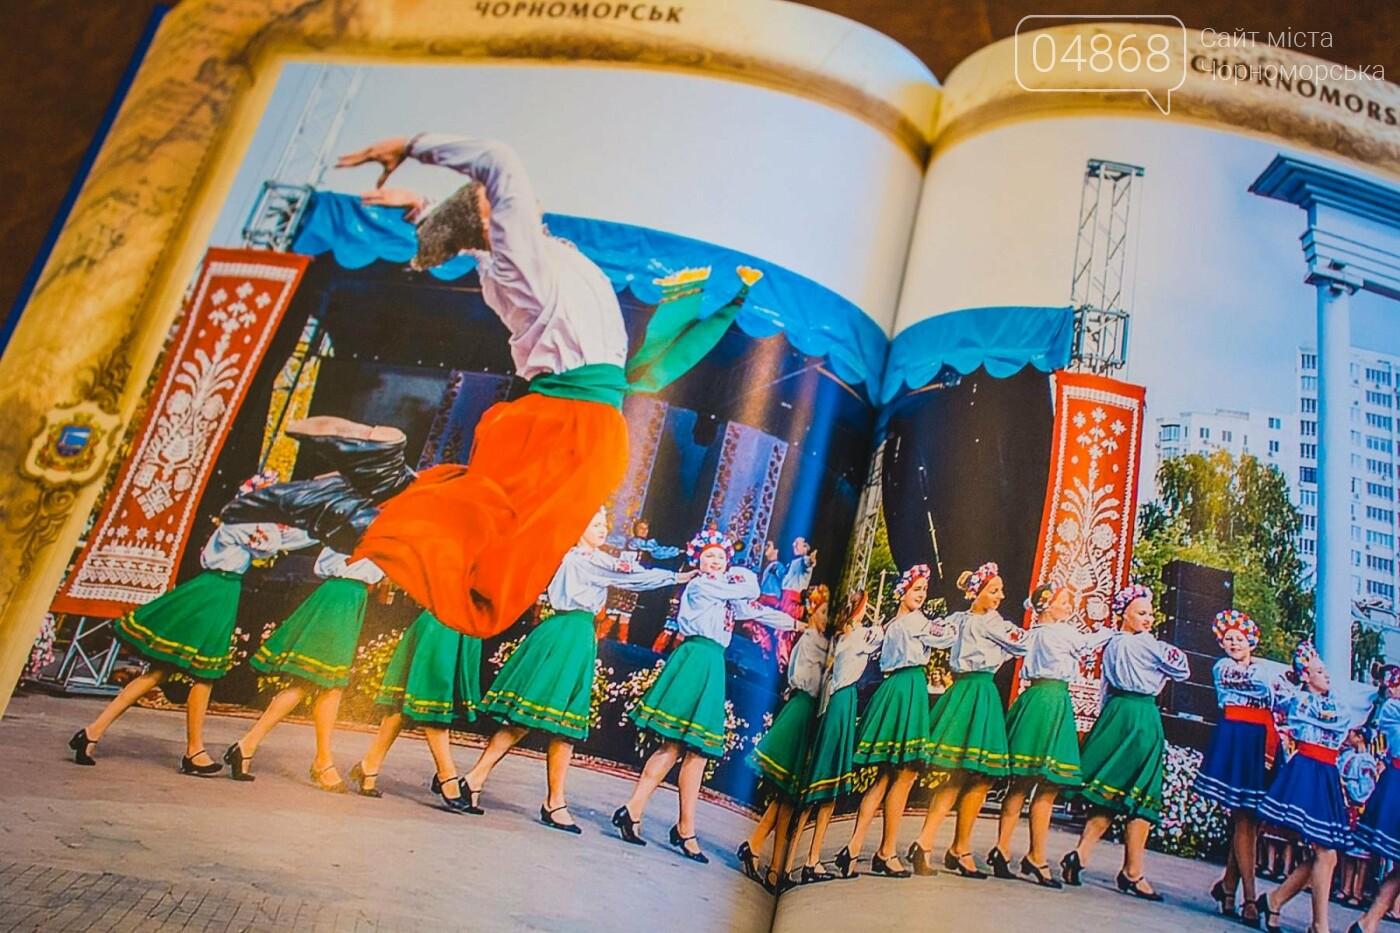 Состоялась презентация книги о Черноморске, фото-11